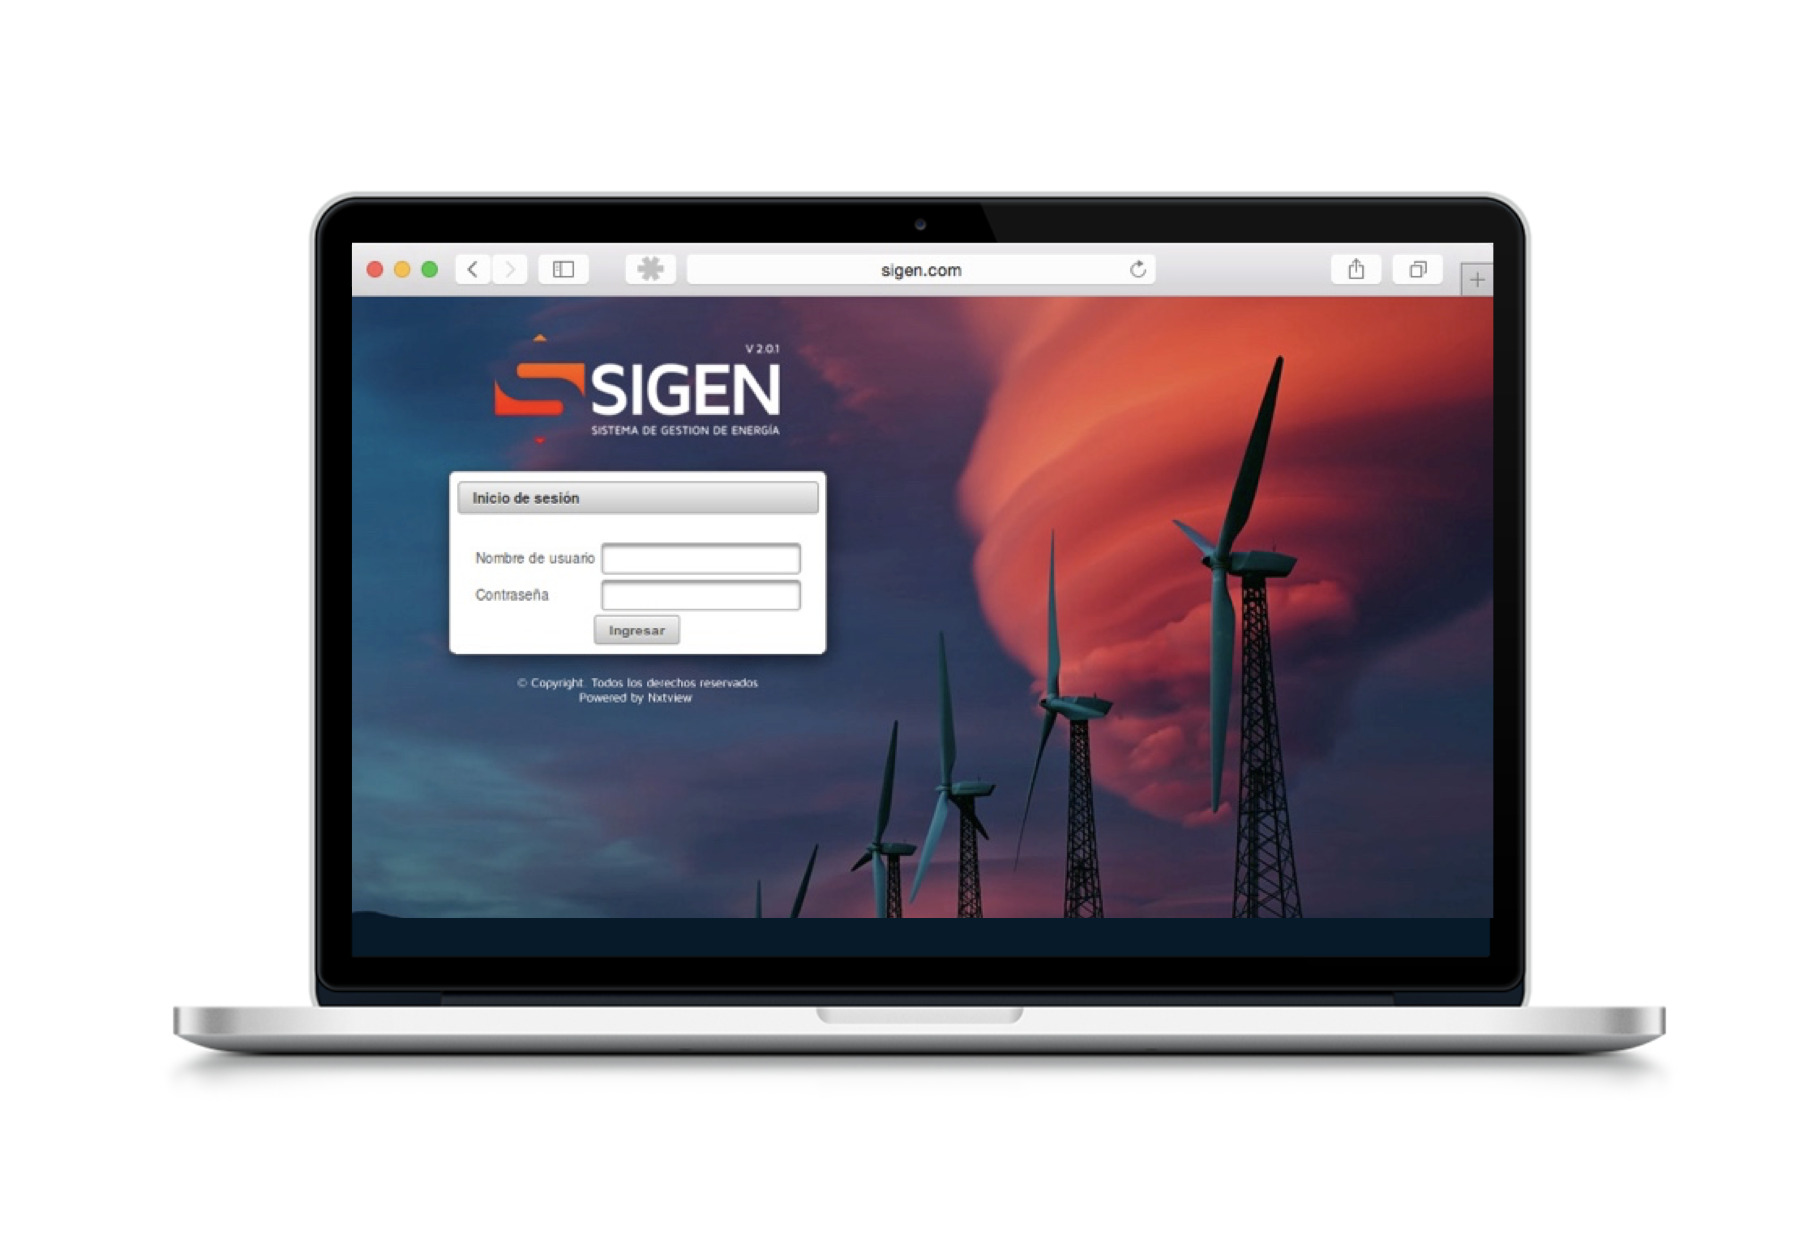 interfaz_sigen-1